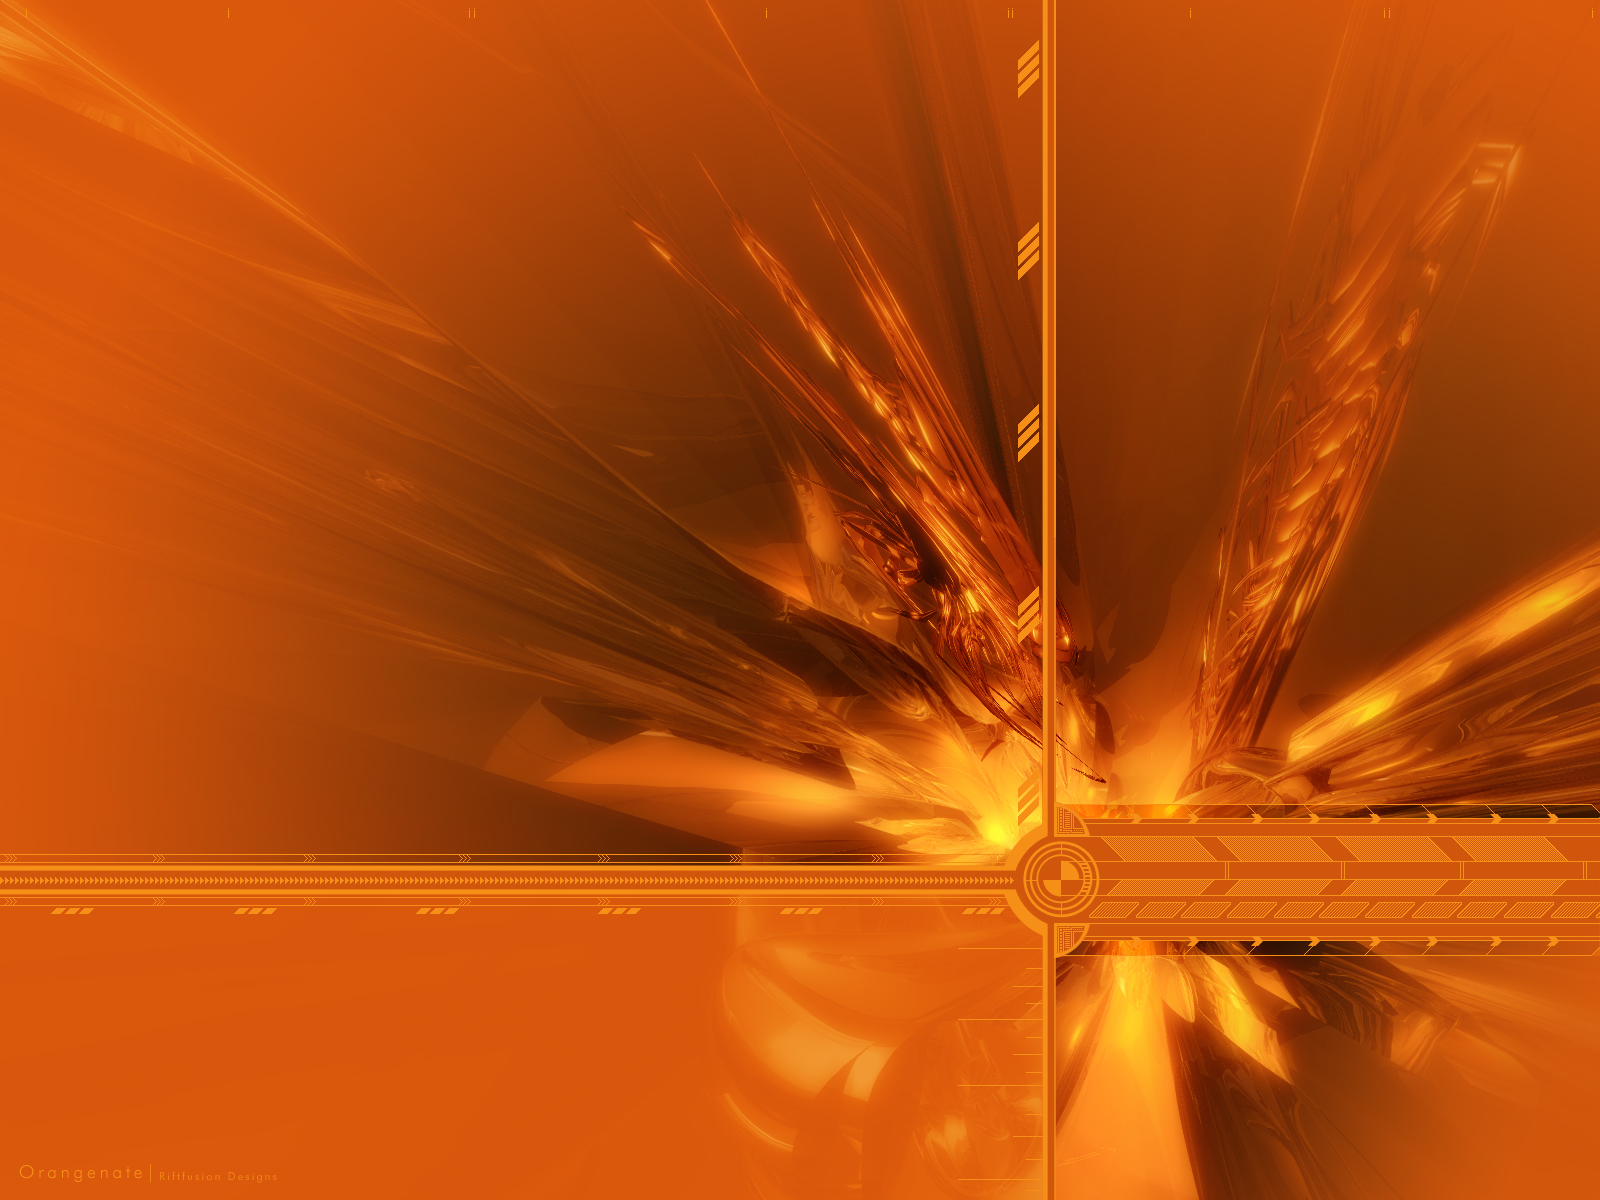 Orange Wallpaper And Background Image 1600x1200 Id 13269